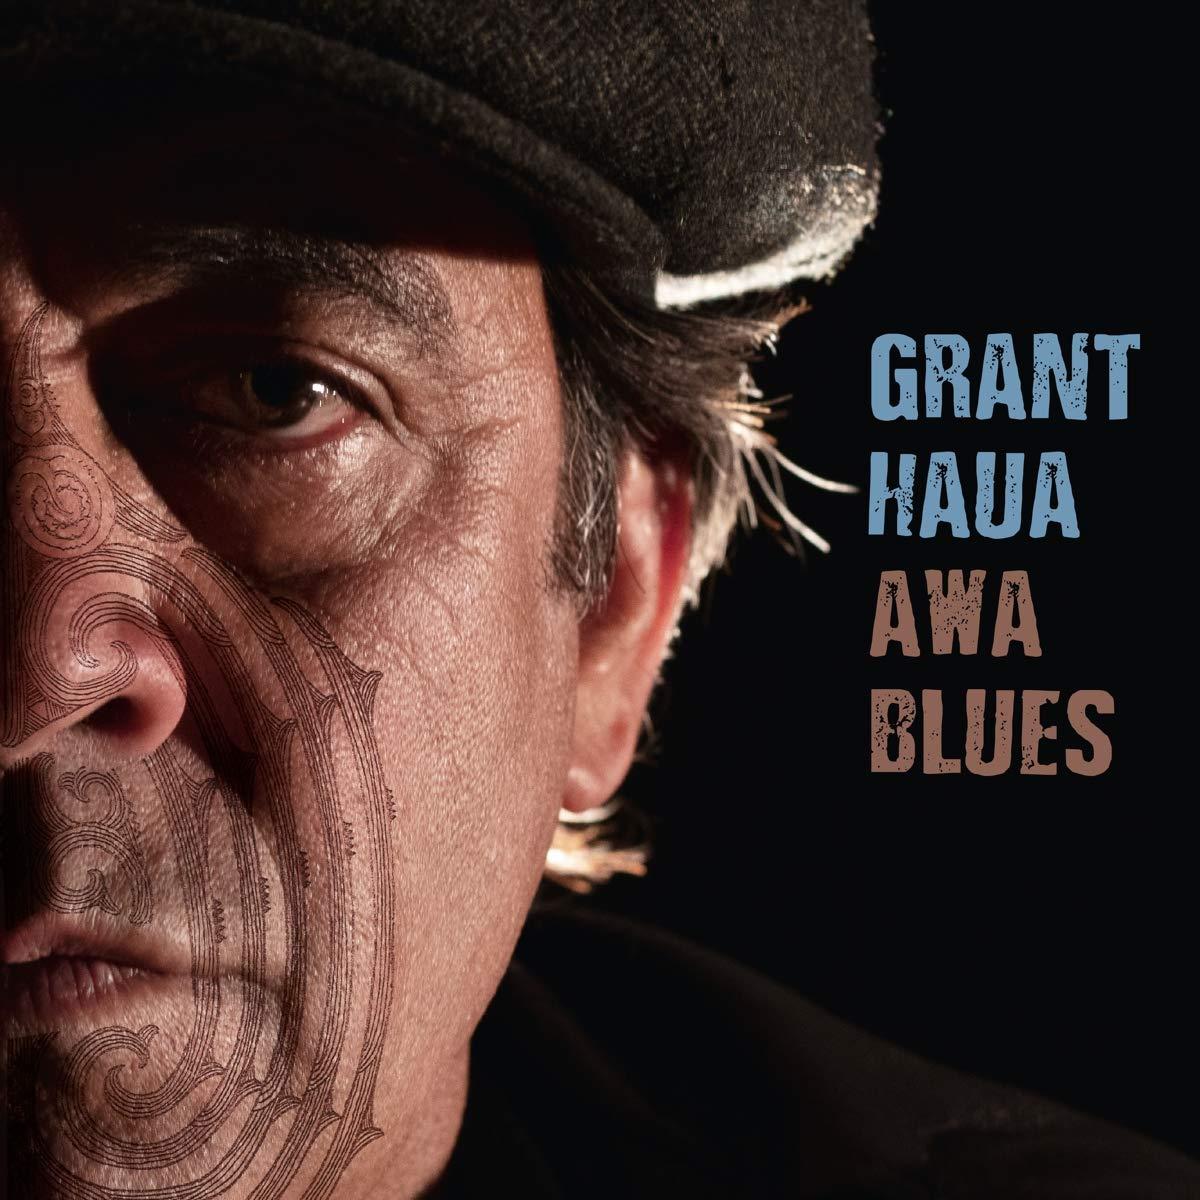 Grant Haua - Awa Blues (2021) [FLAC] Download